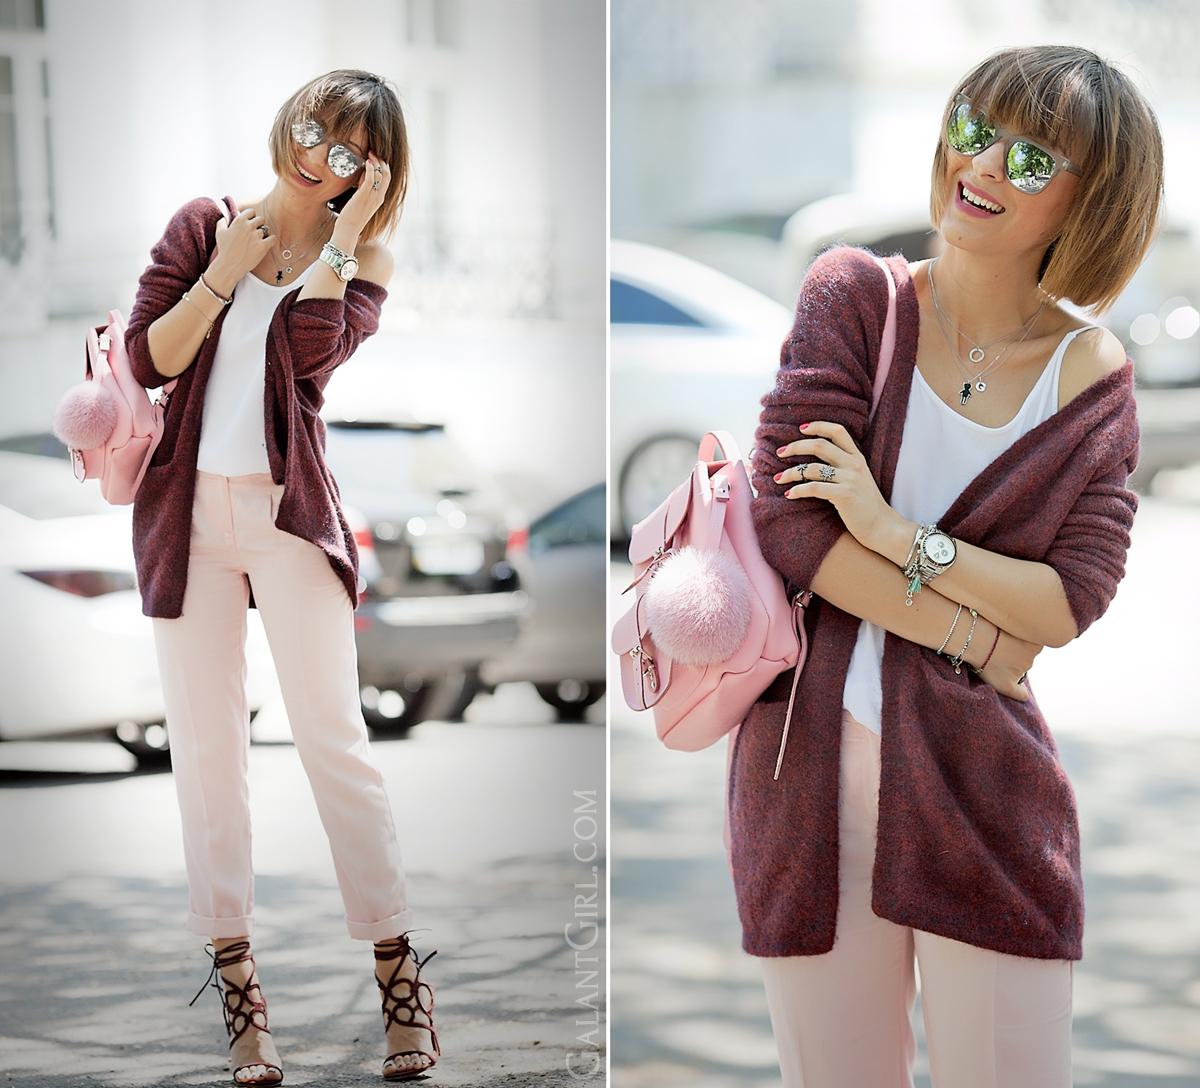 streetstyle-galantgirl-grafeabackpack-grafea-grafeaoutfit-fashionblogger-fashionbloggerRUNET-croppedpinktrousers-